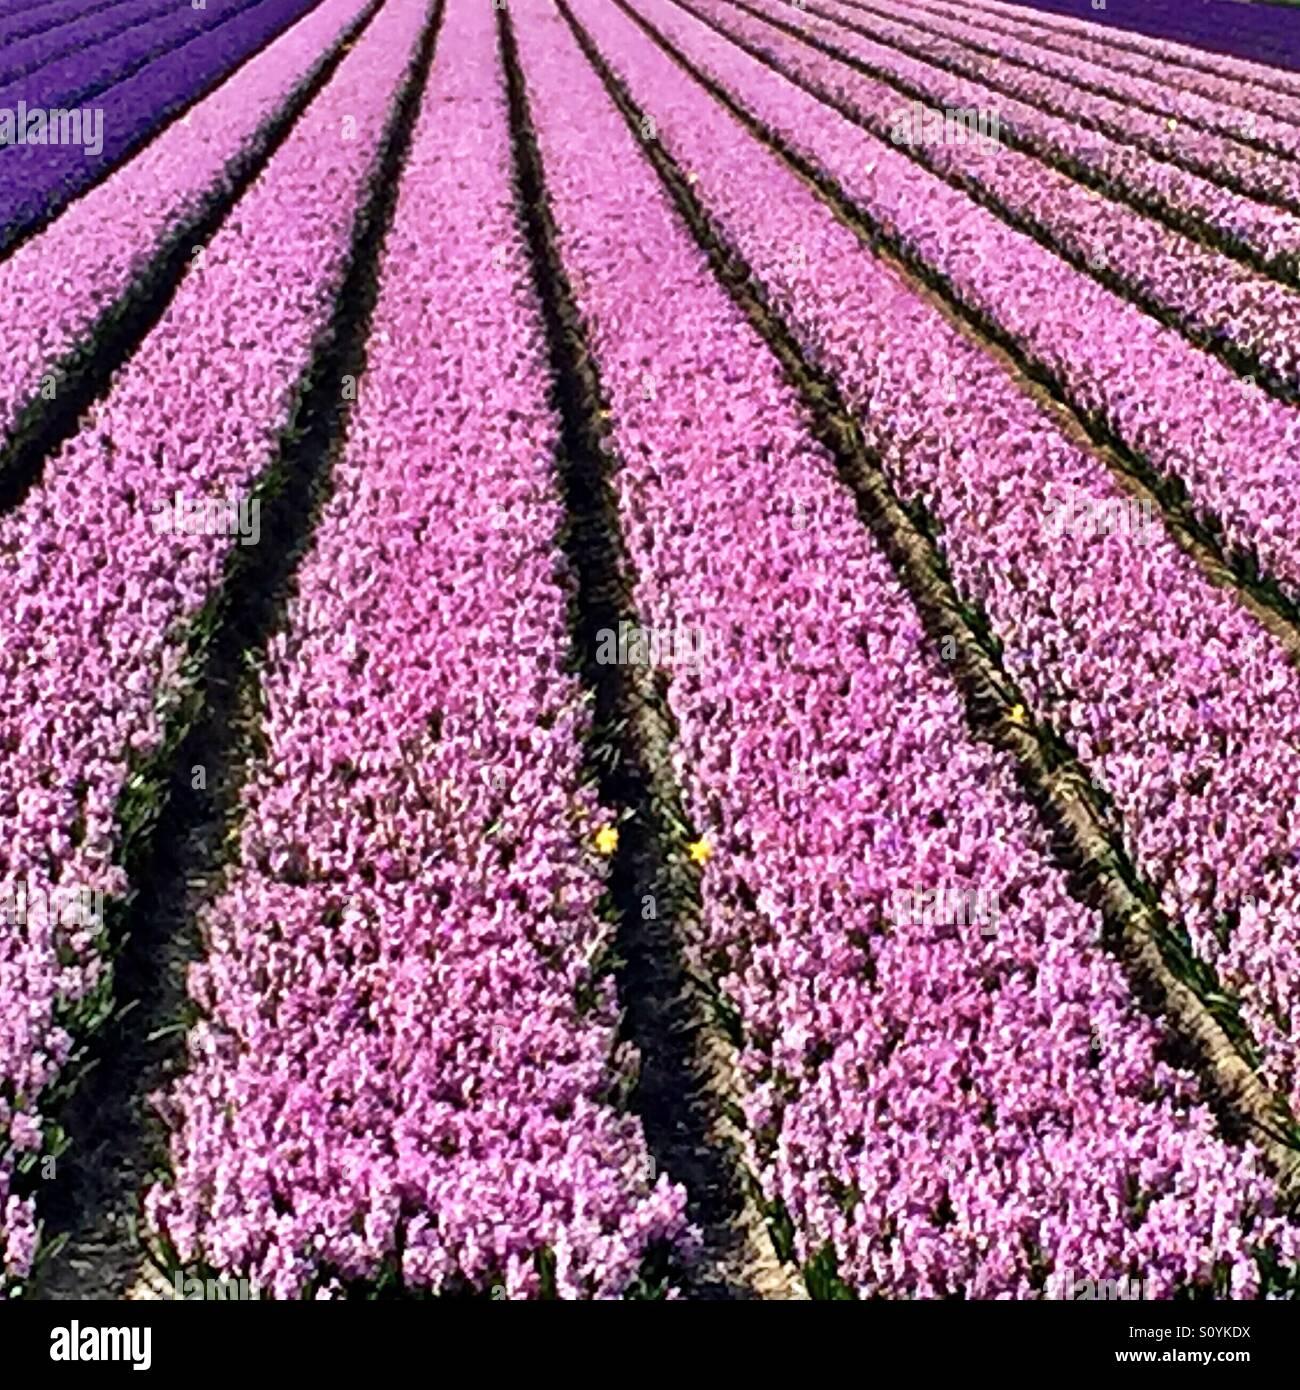 Felder der blühenden rosa und lila Hyazinthe in Holland. Stockbild